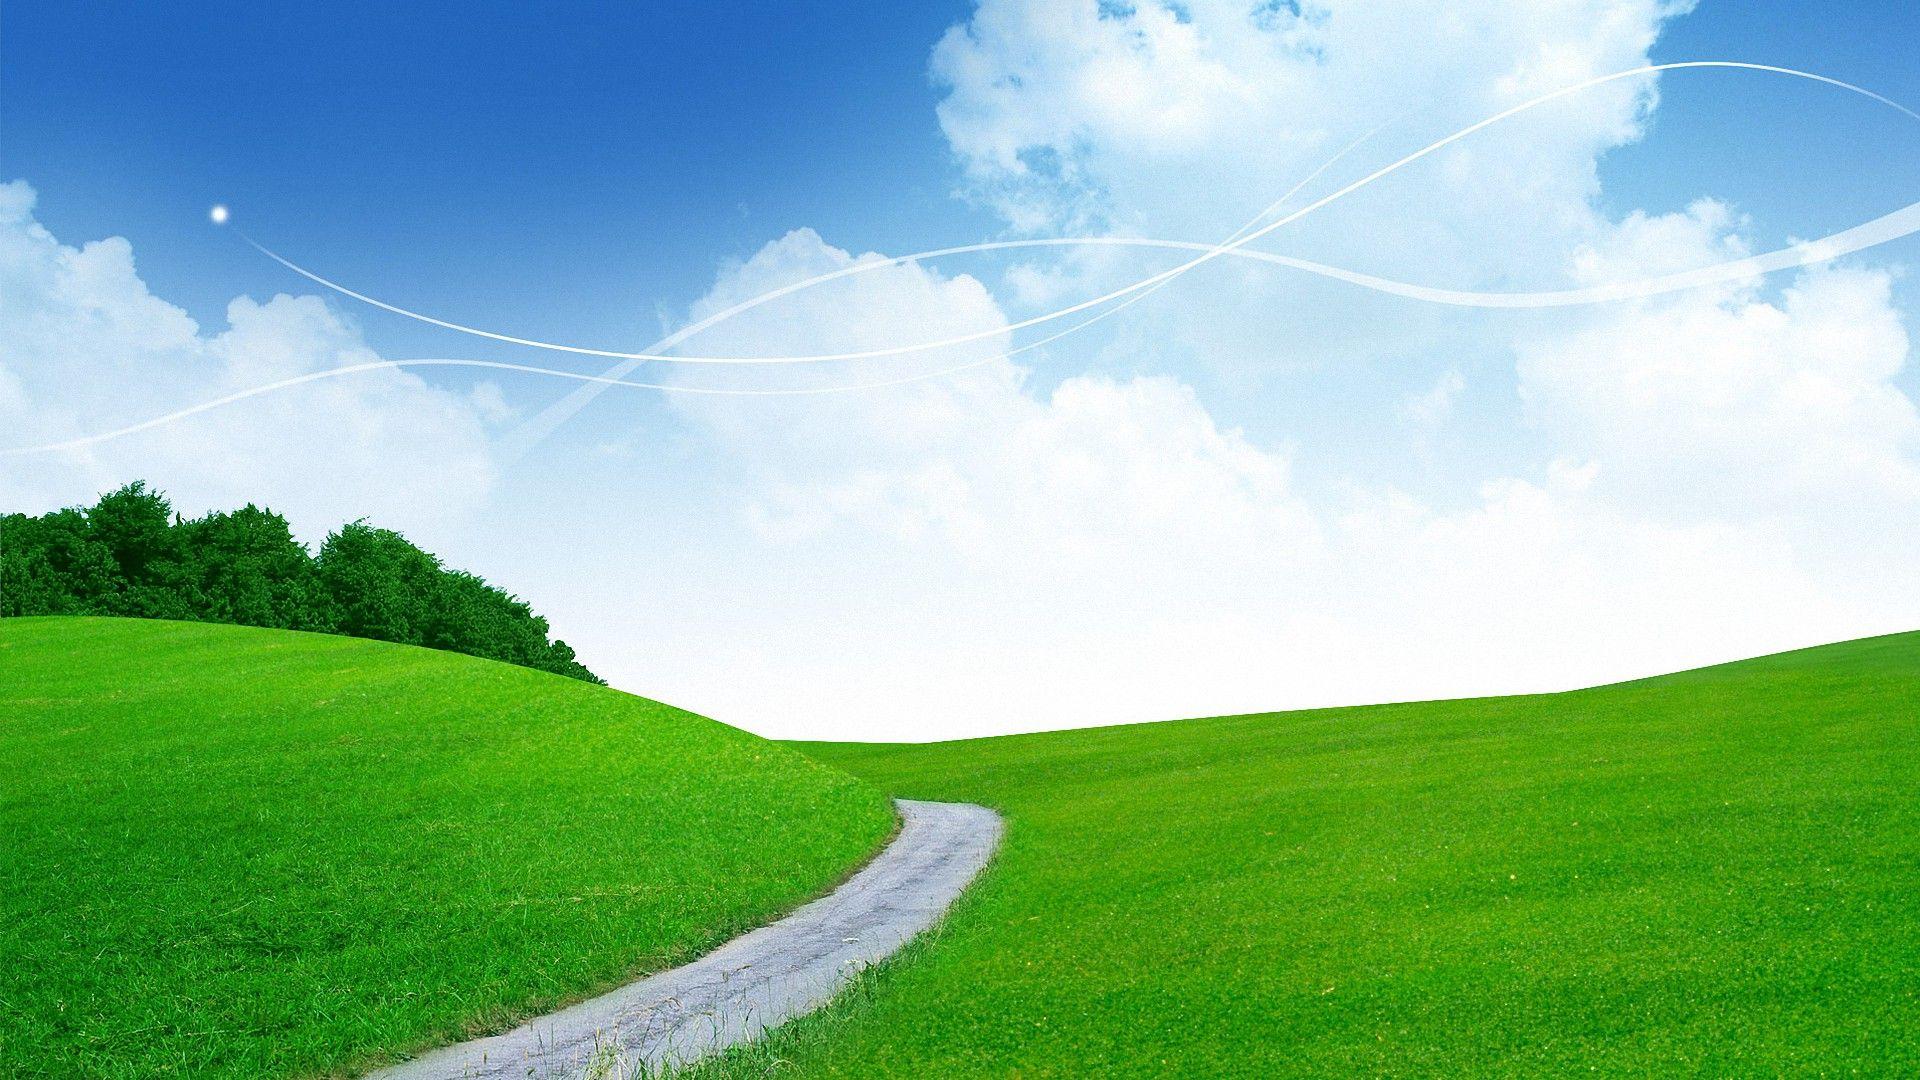 Dream World Fantasy Landscapes Backgrounds Beautiful Wallpaper Hd Scenery Cloud